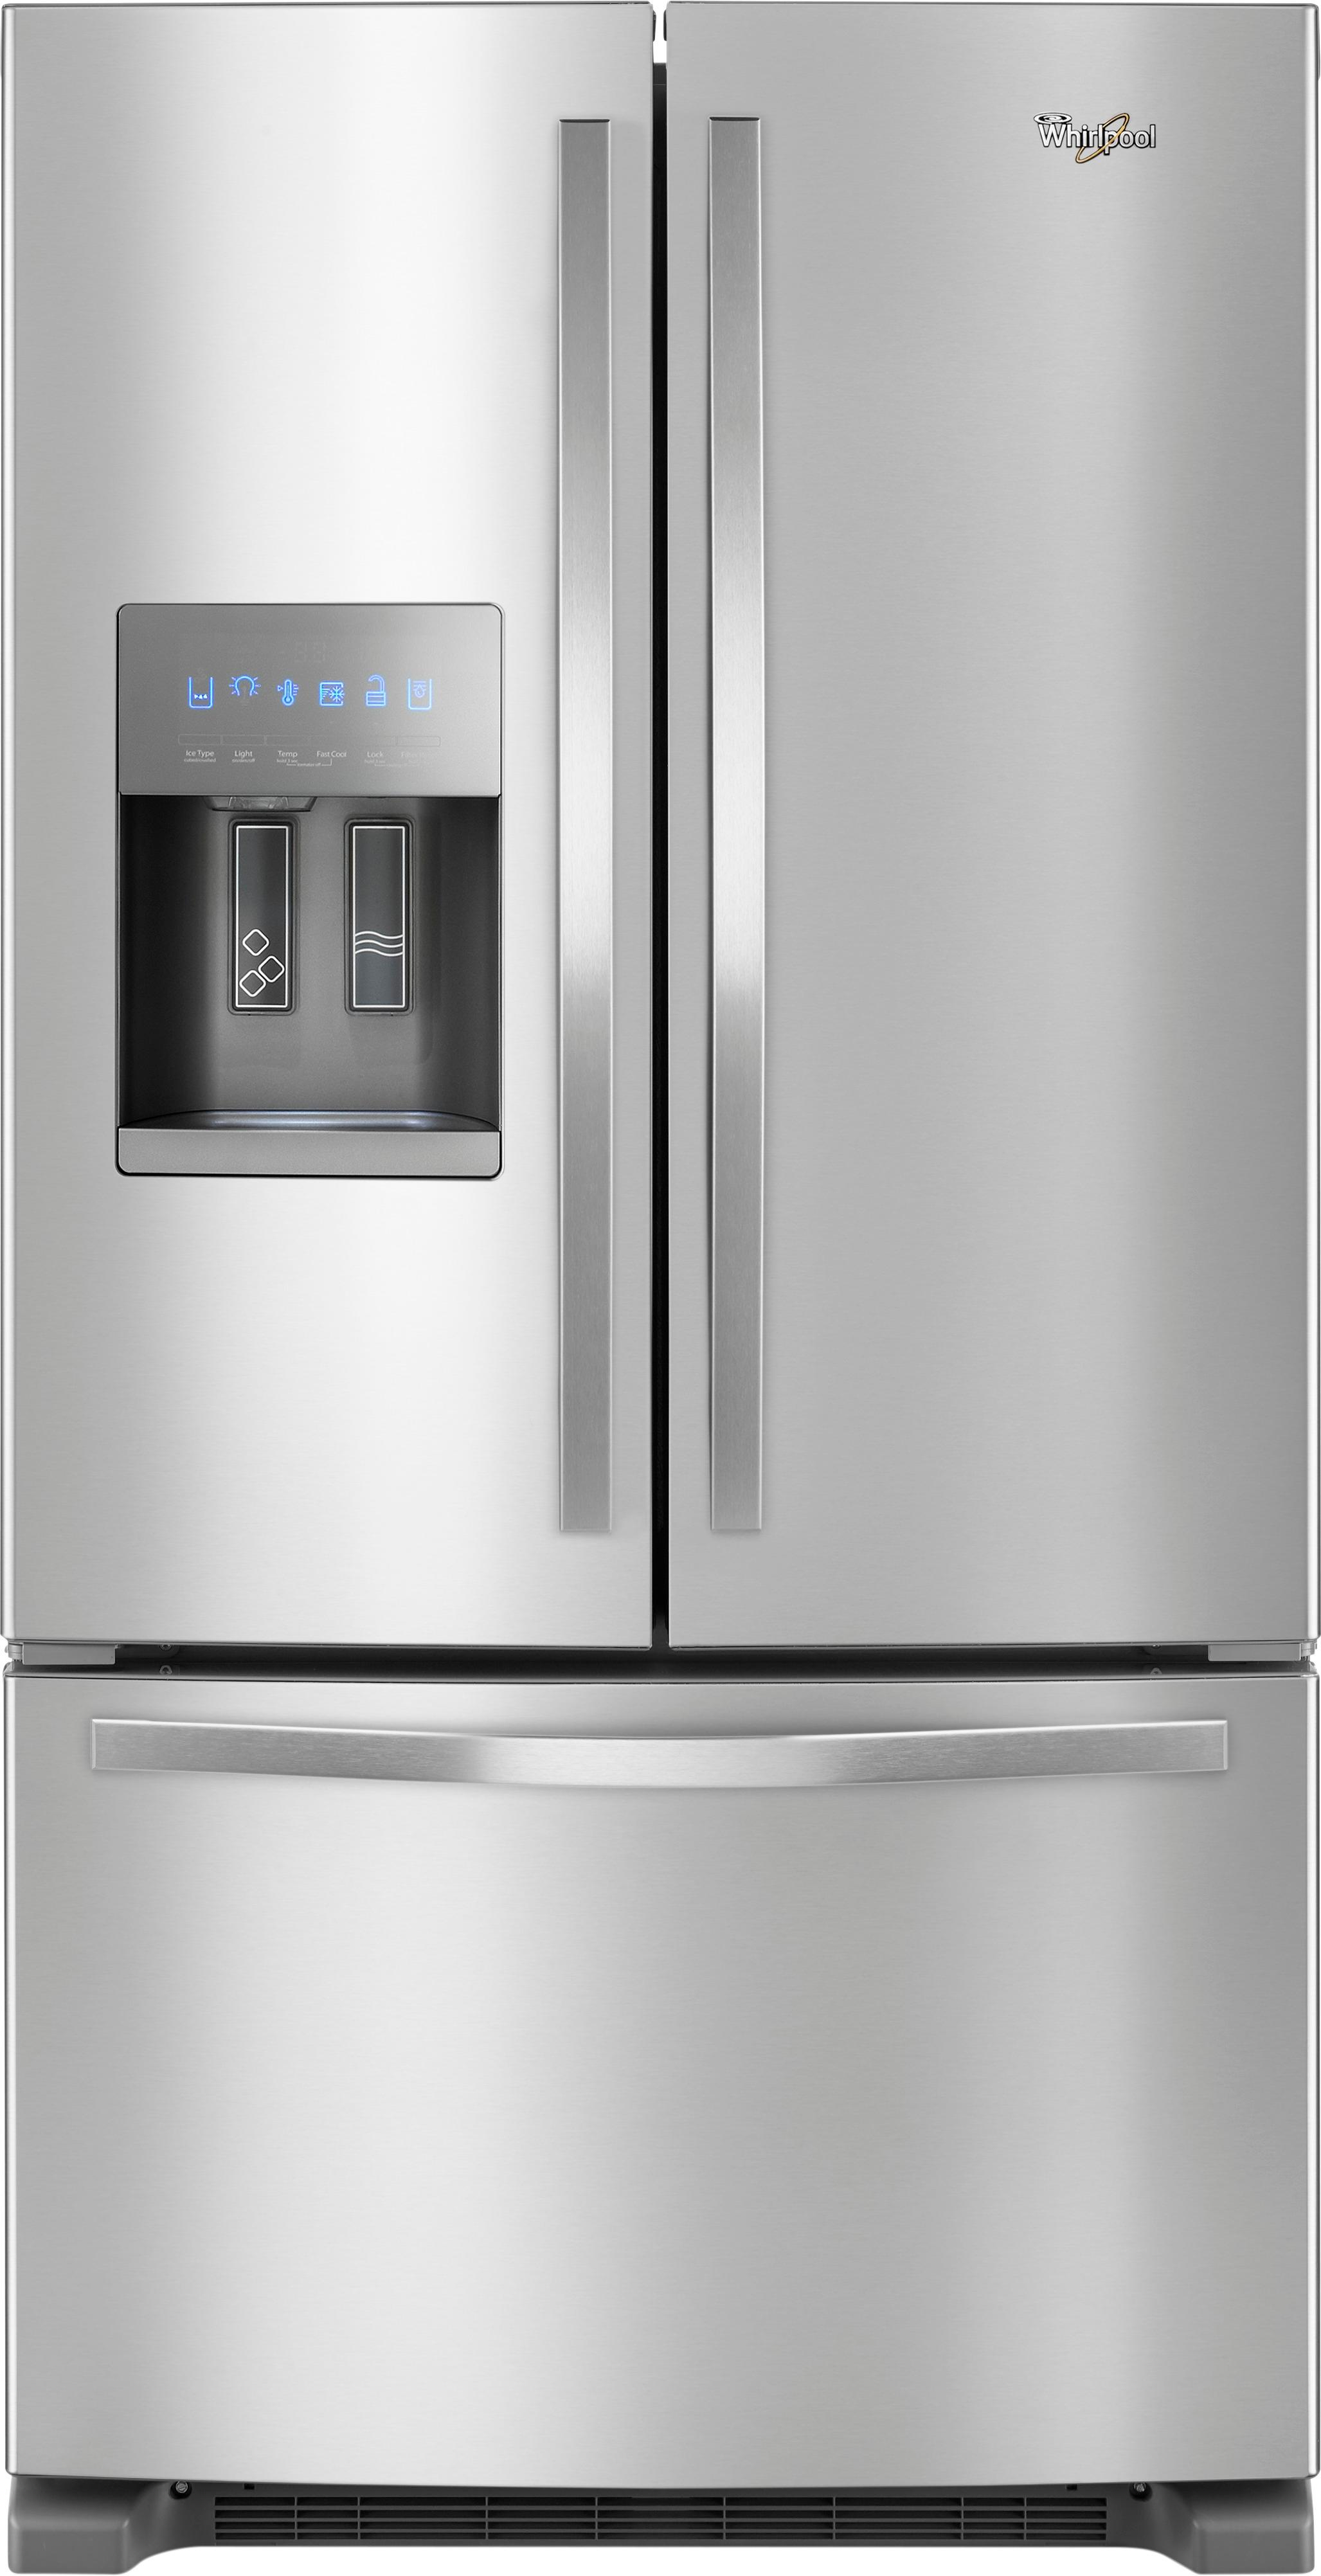 Whirlpool Refrigerator Repair >> Whirlpool Appliance Repair 805 626 0107 Servicing